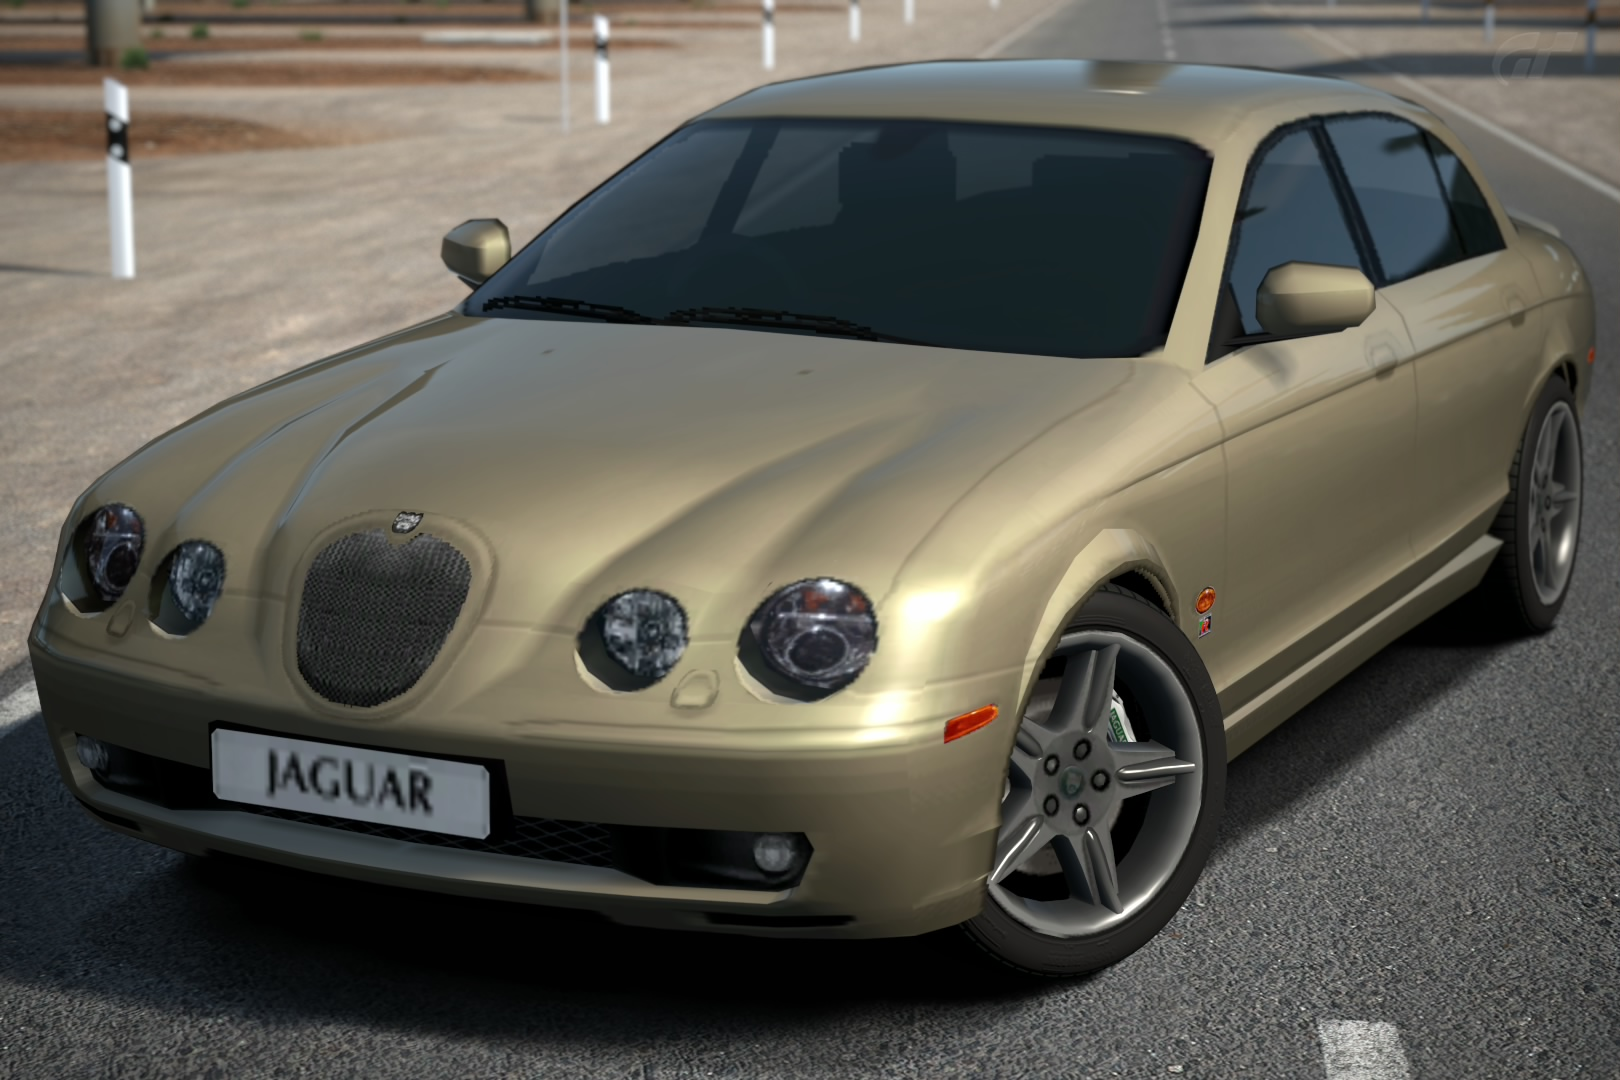 Jaguar S Type R 02 Gran Turismo Wiki Fandom Powered